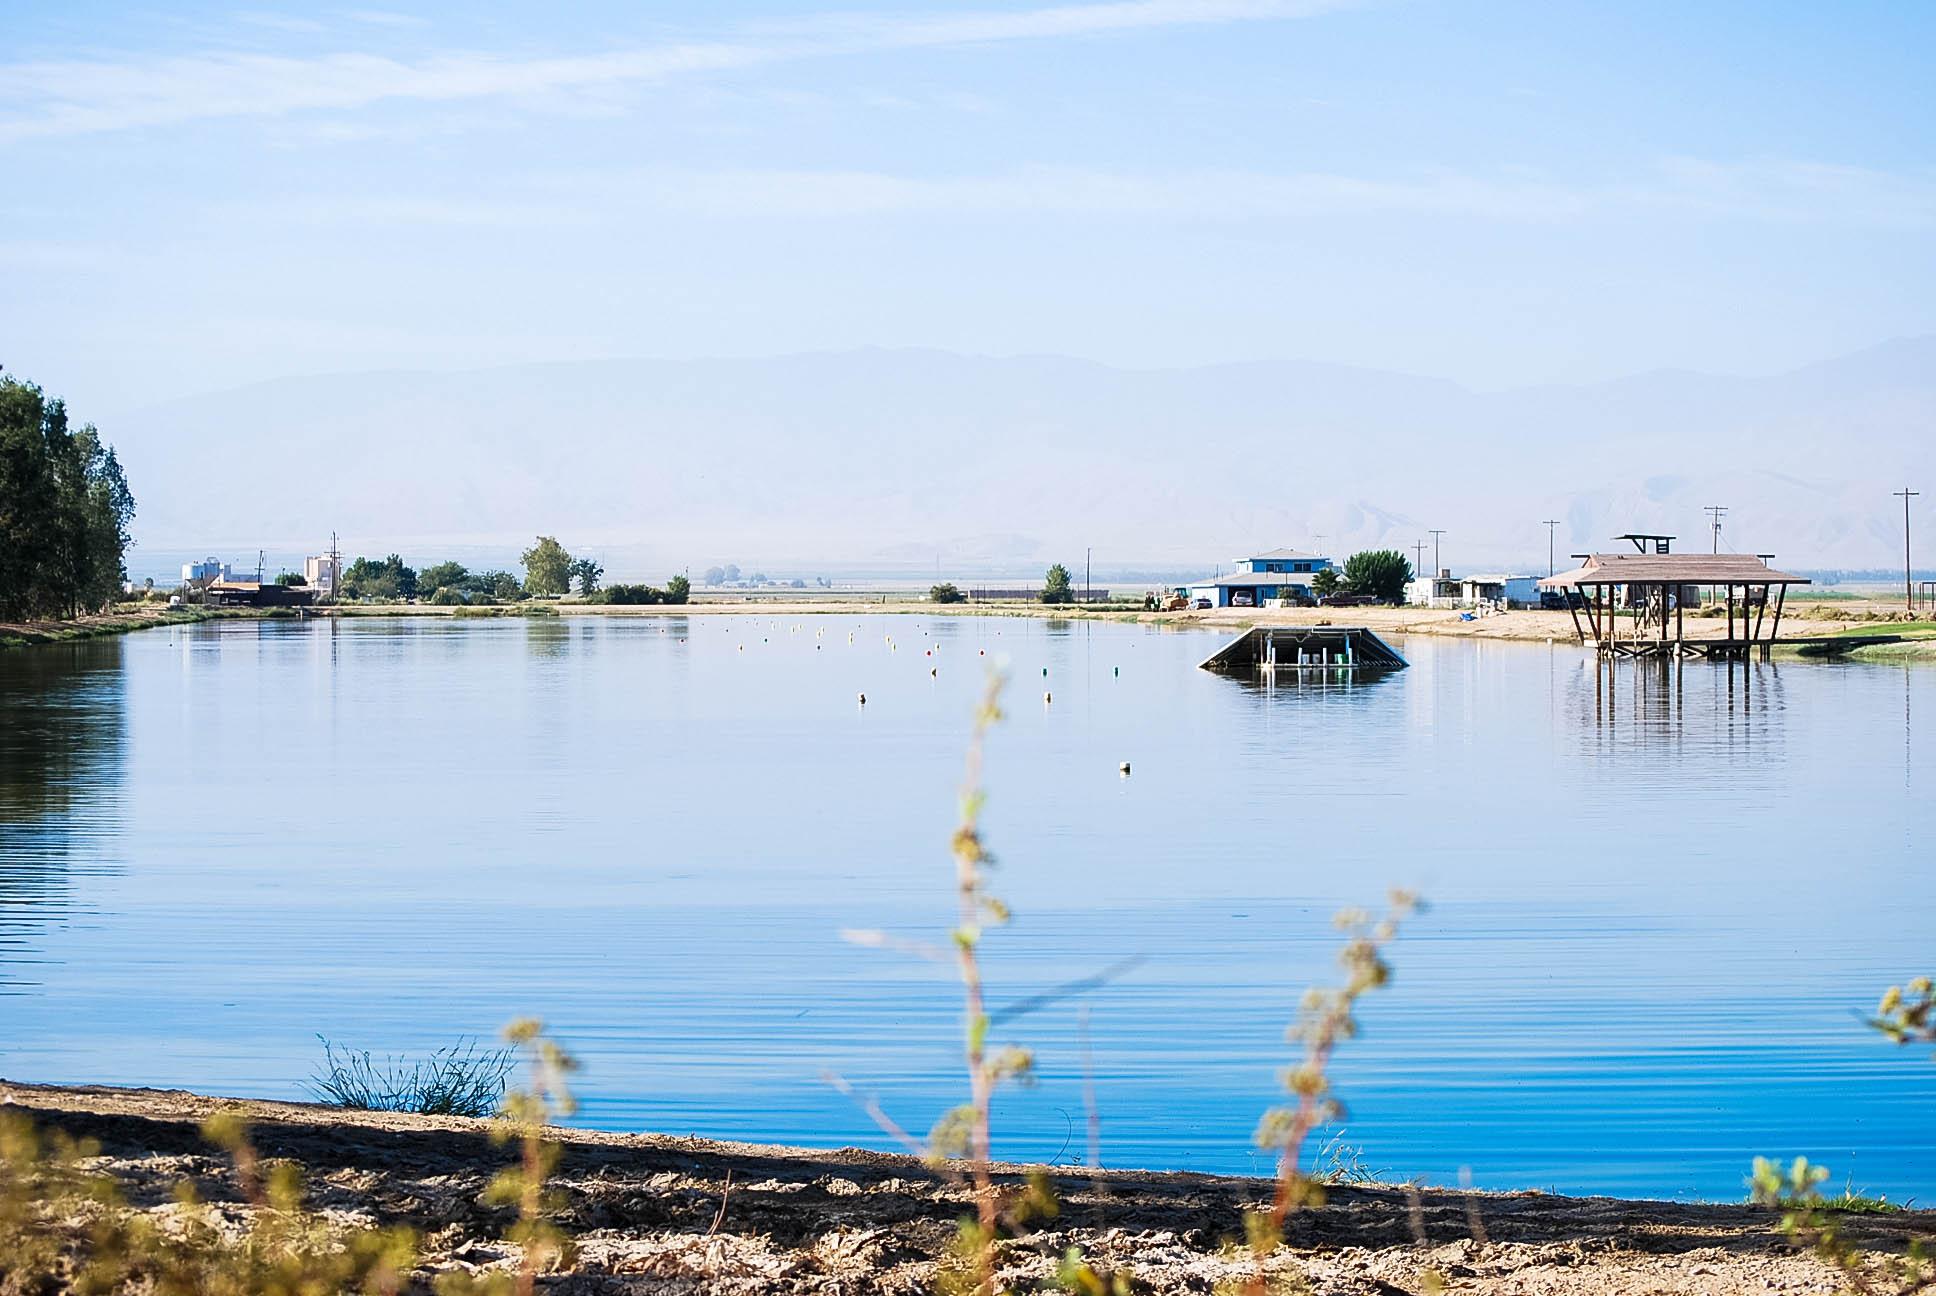 ironwood-ranch-lakes-1.jpg